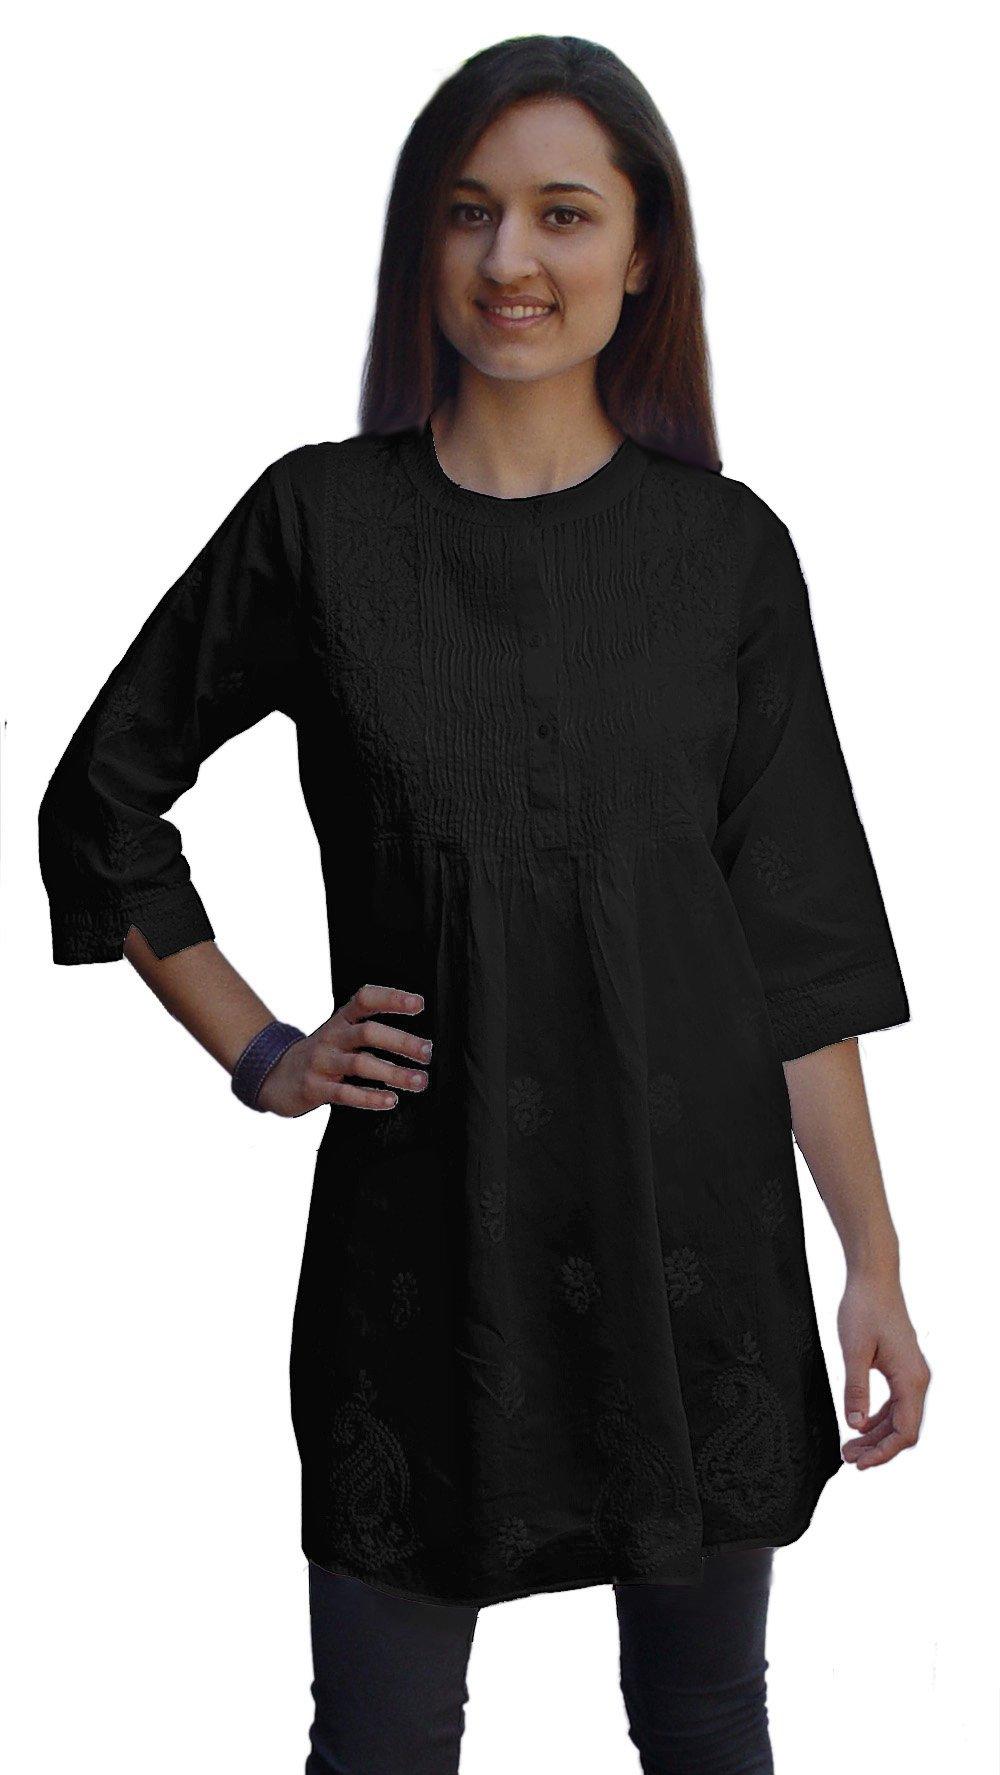 Ayurvastram Pure Cotton Hand Embroidered Tunic, Top, Kurti, Blouse: Black: Size 28W Plus